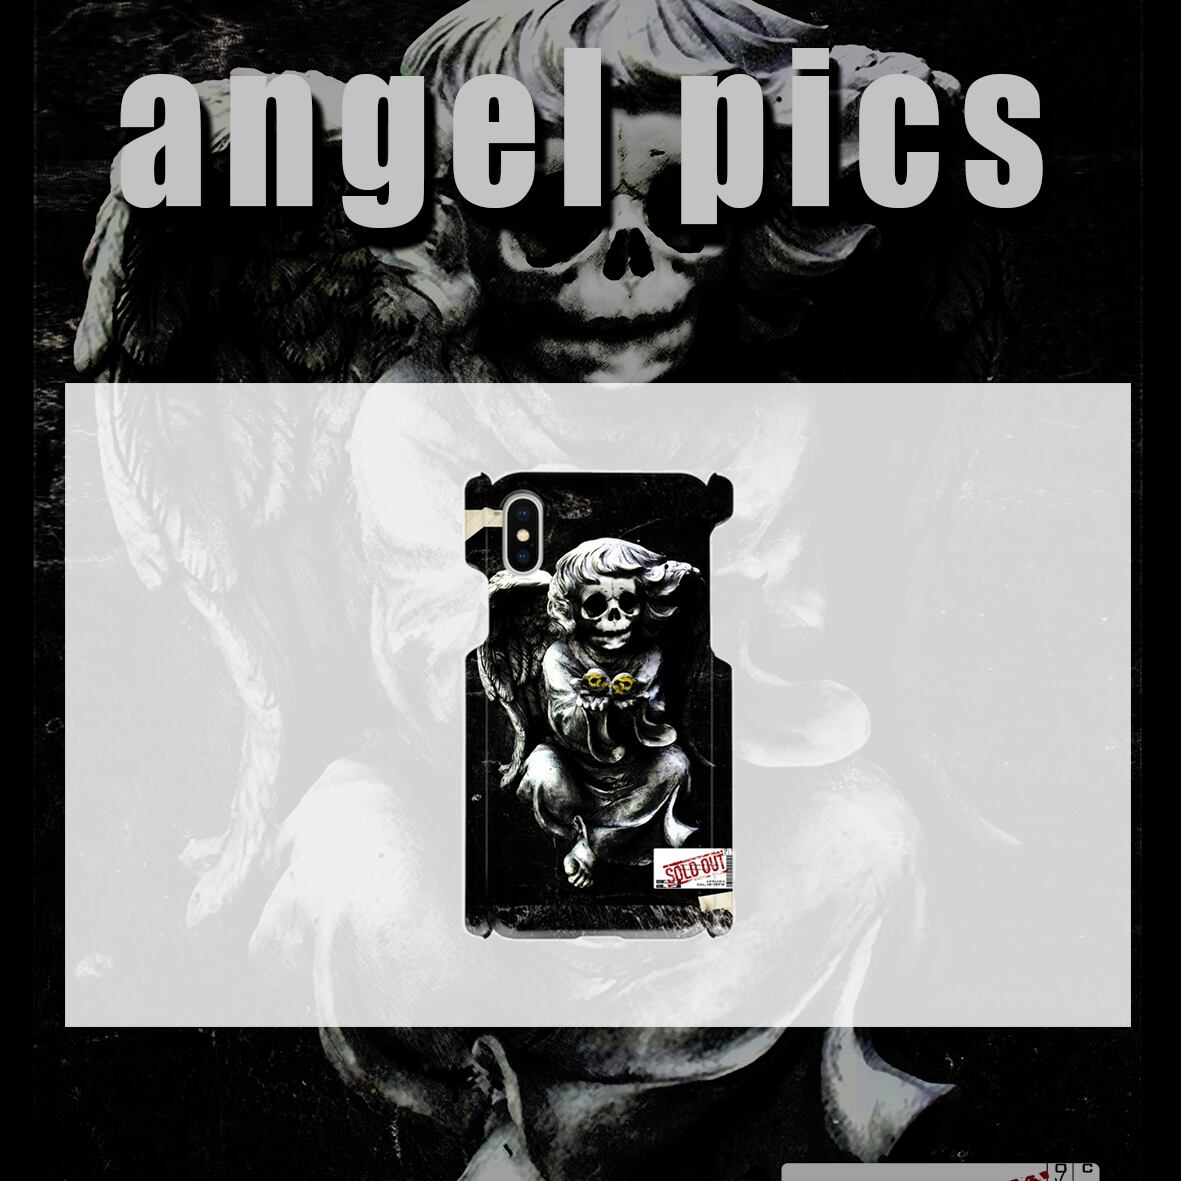 angel pics case コートタイプ (ツヤあり)